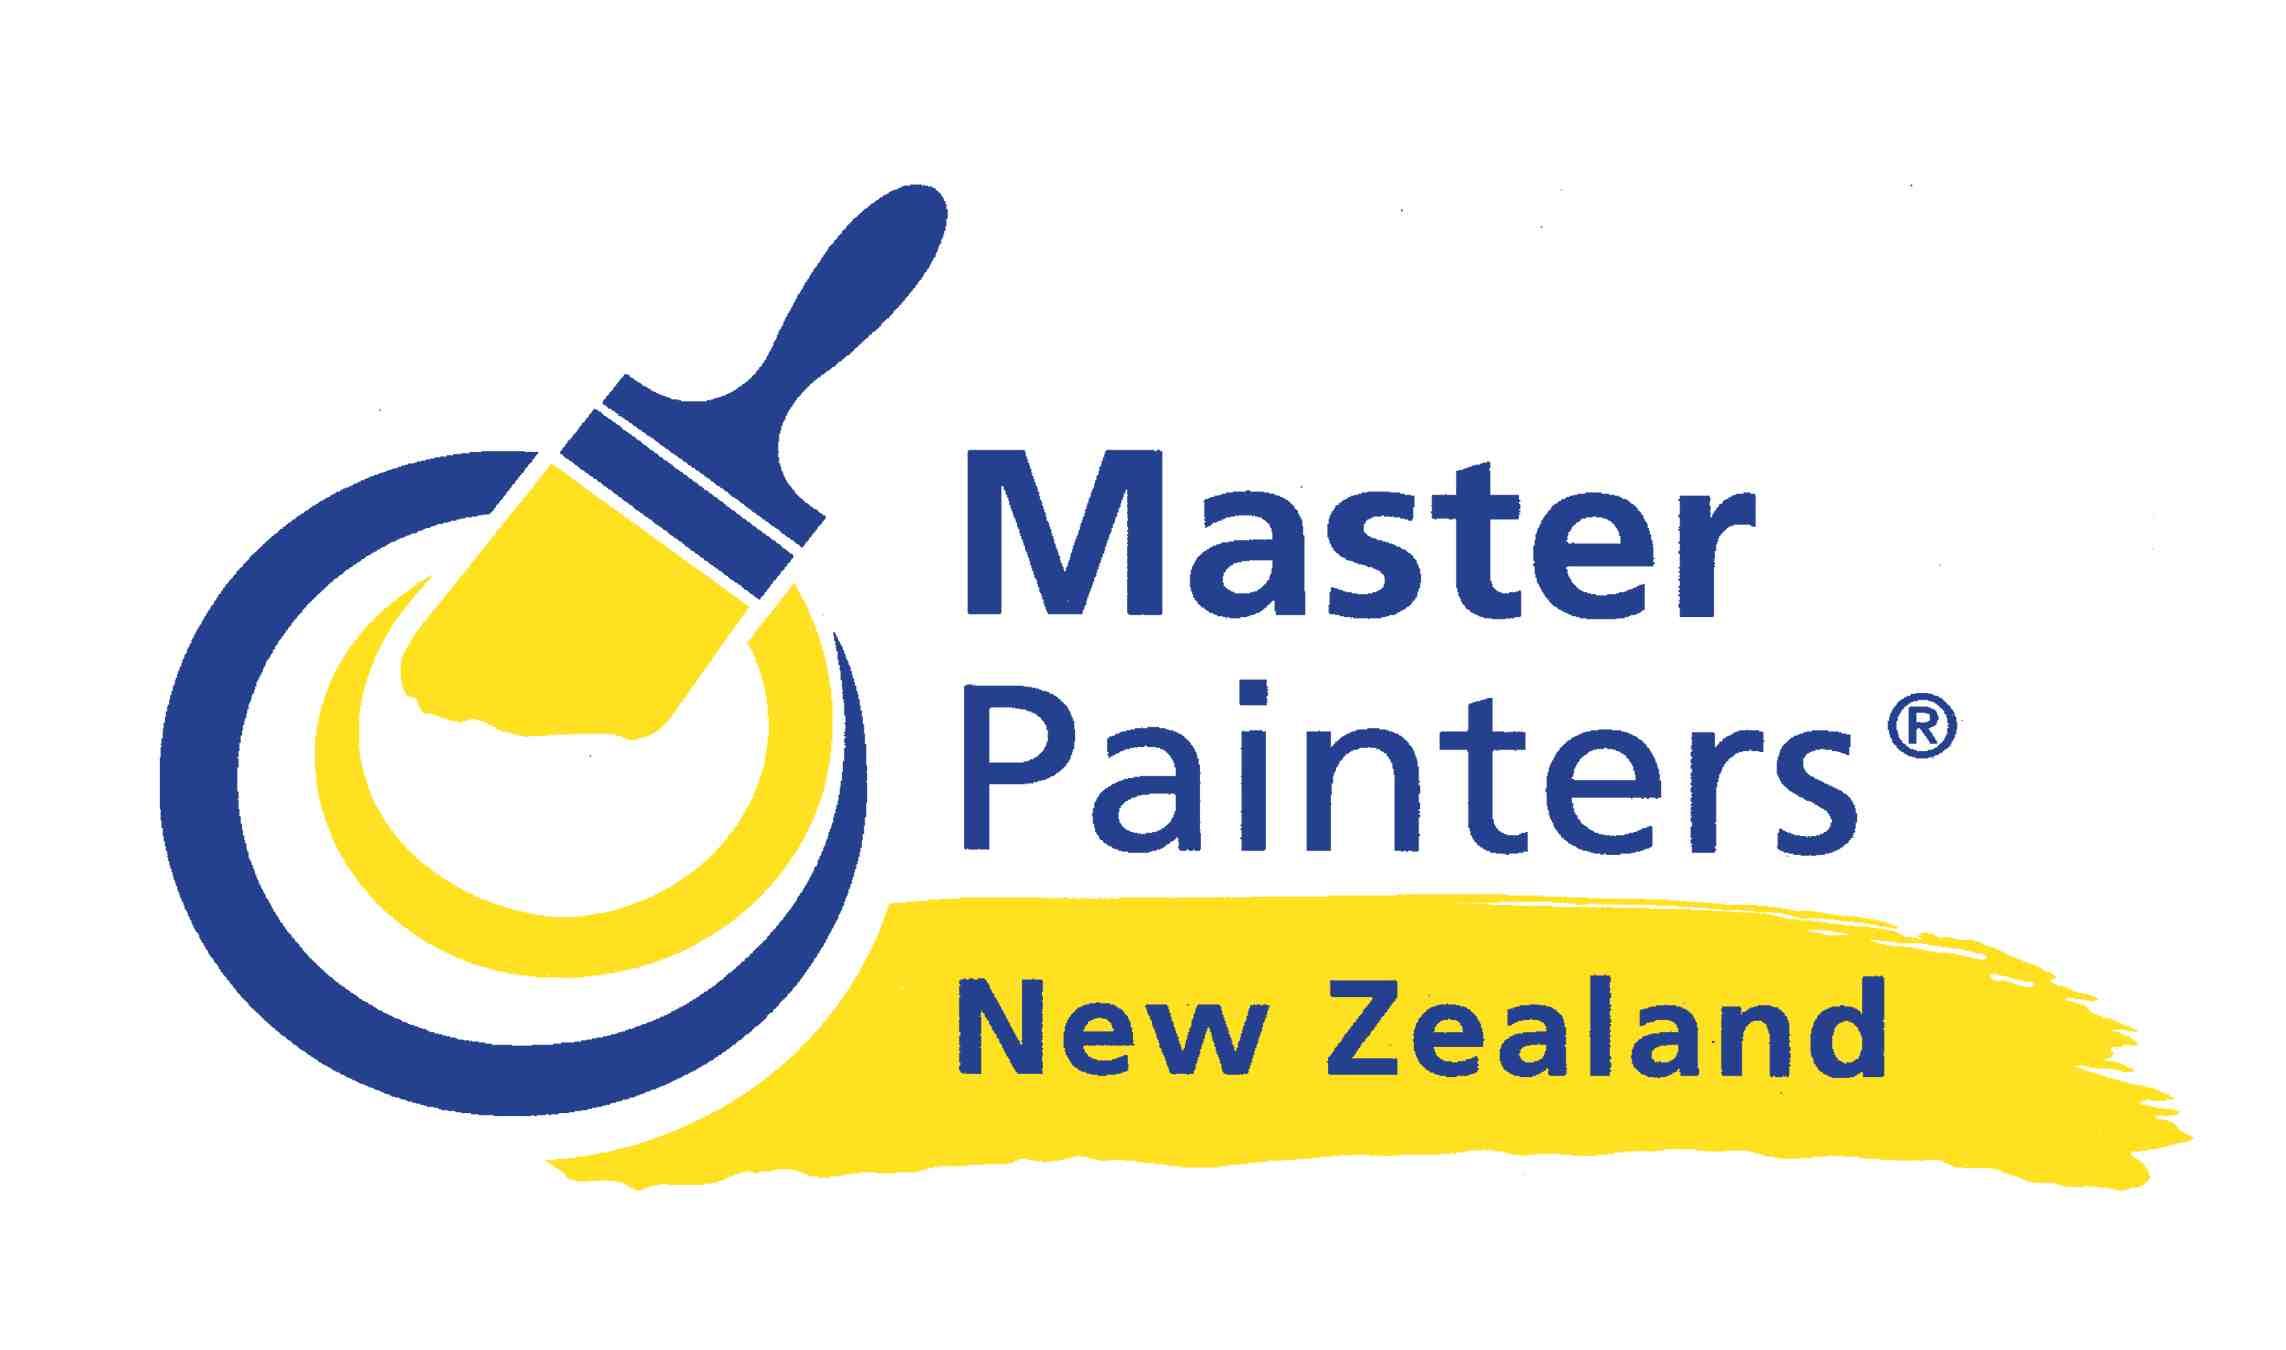 Master Painters New Zealand Ltd